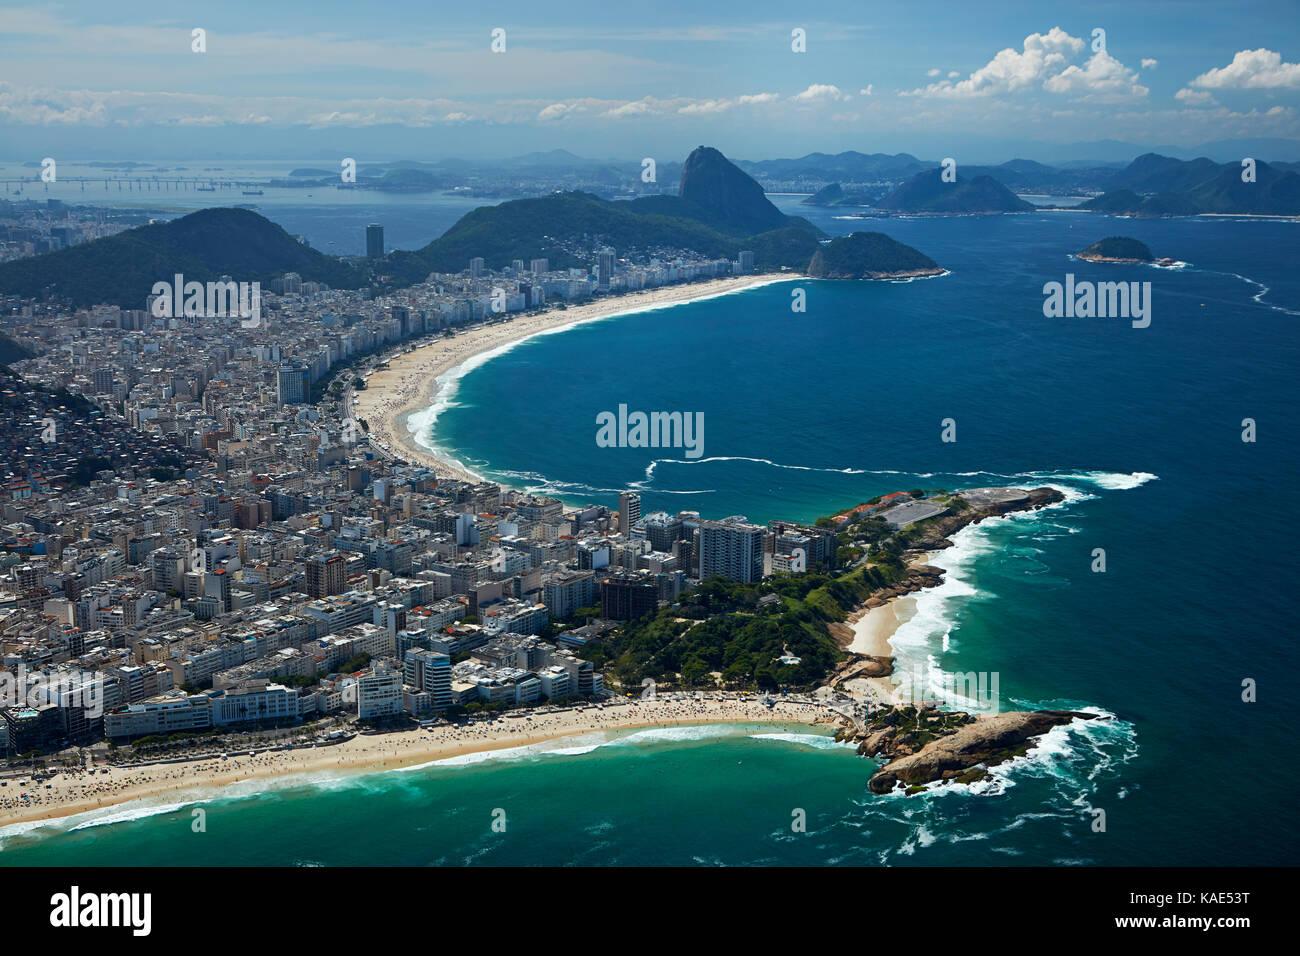 People on Ipanema Beach, and Copacabana Beach (top), Rio de Janeiro, Brazil, South America - aerial Stock Photo